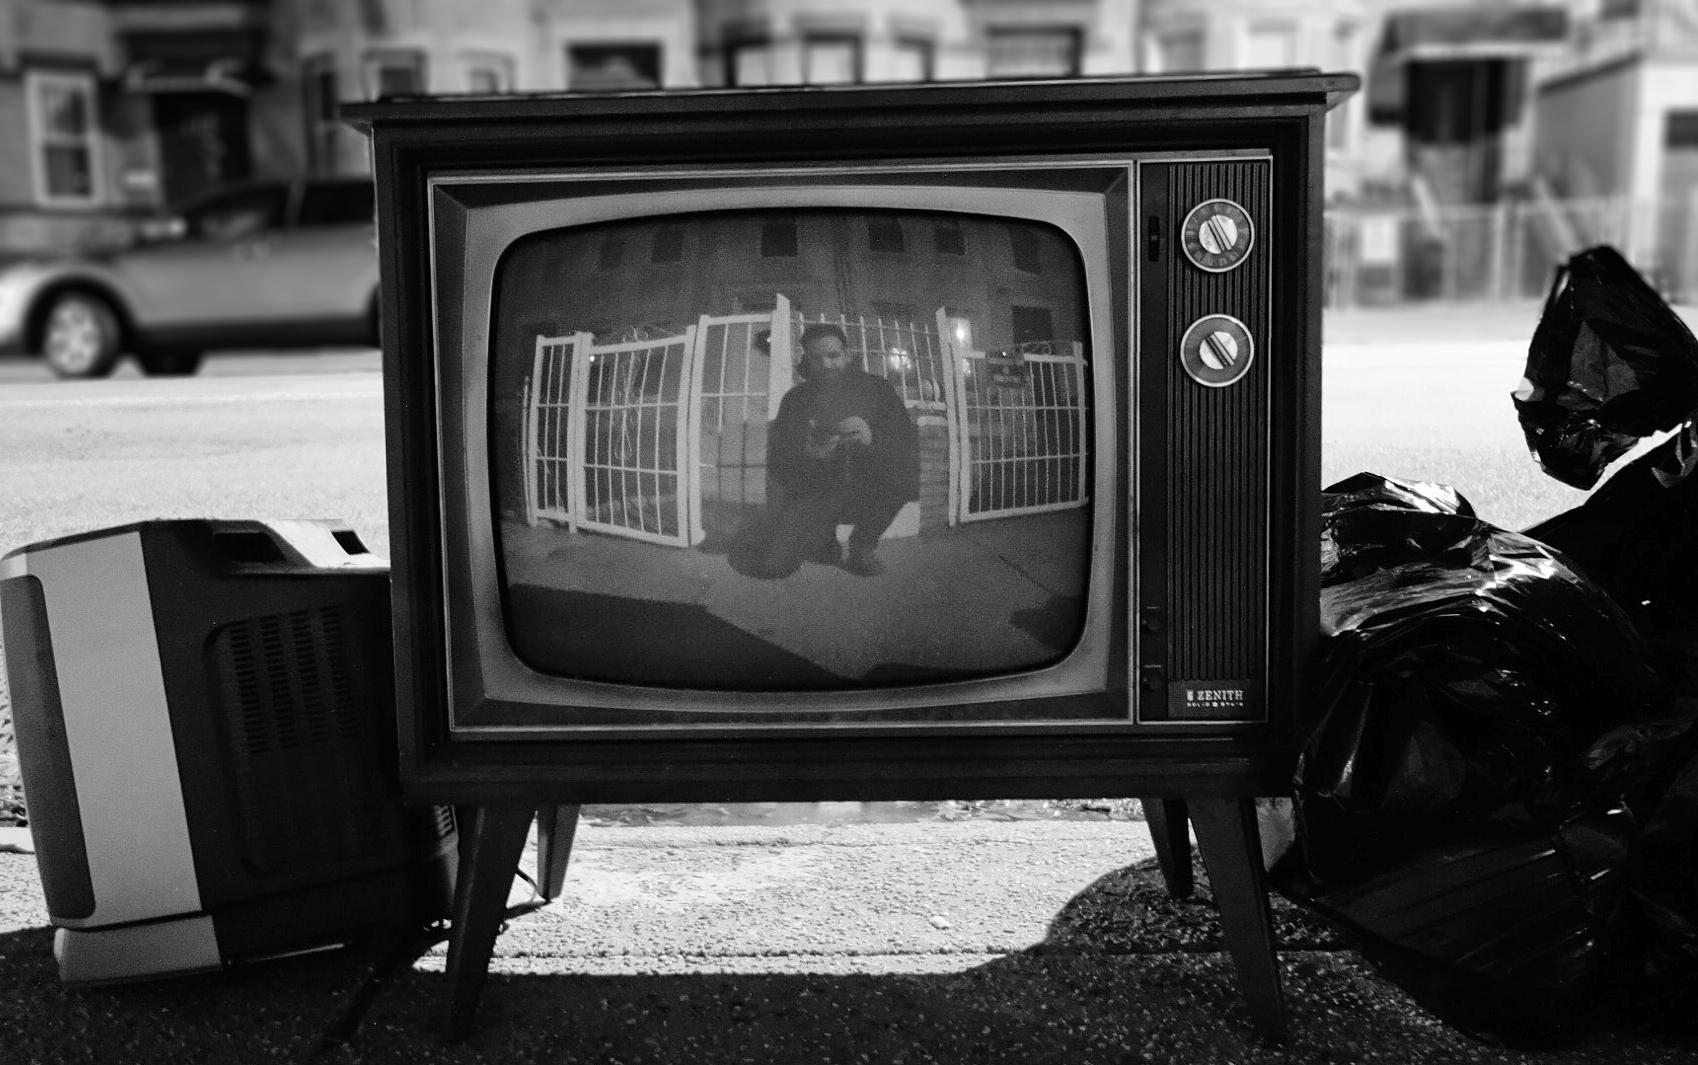 рецепт картинки на телевизор жкх лучших фото